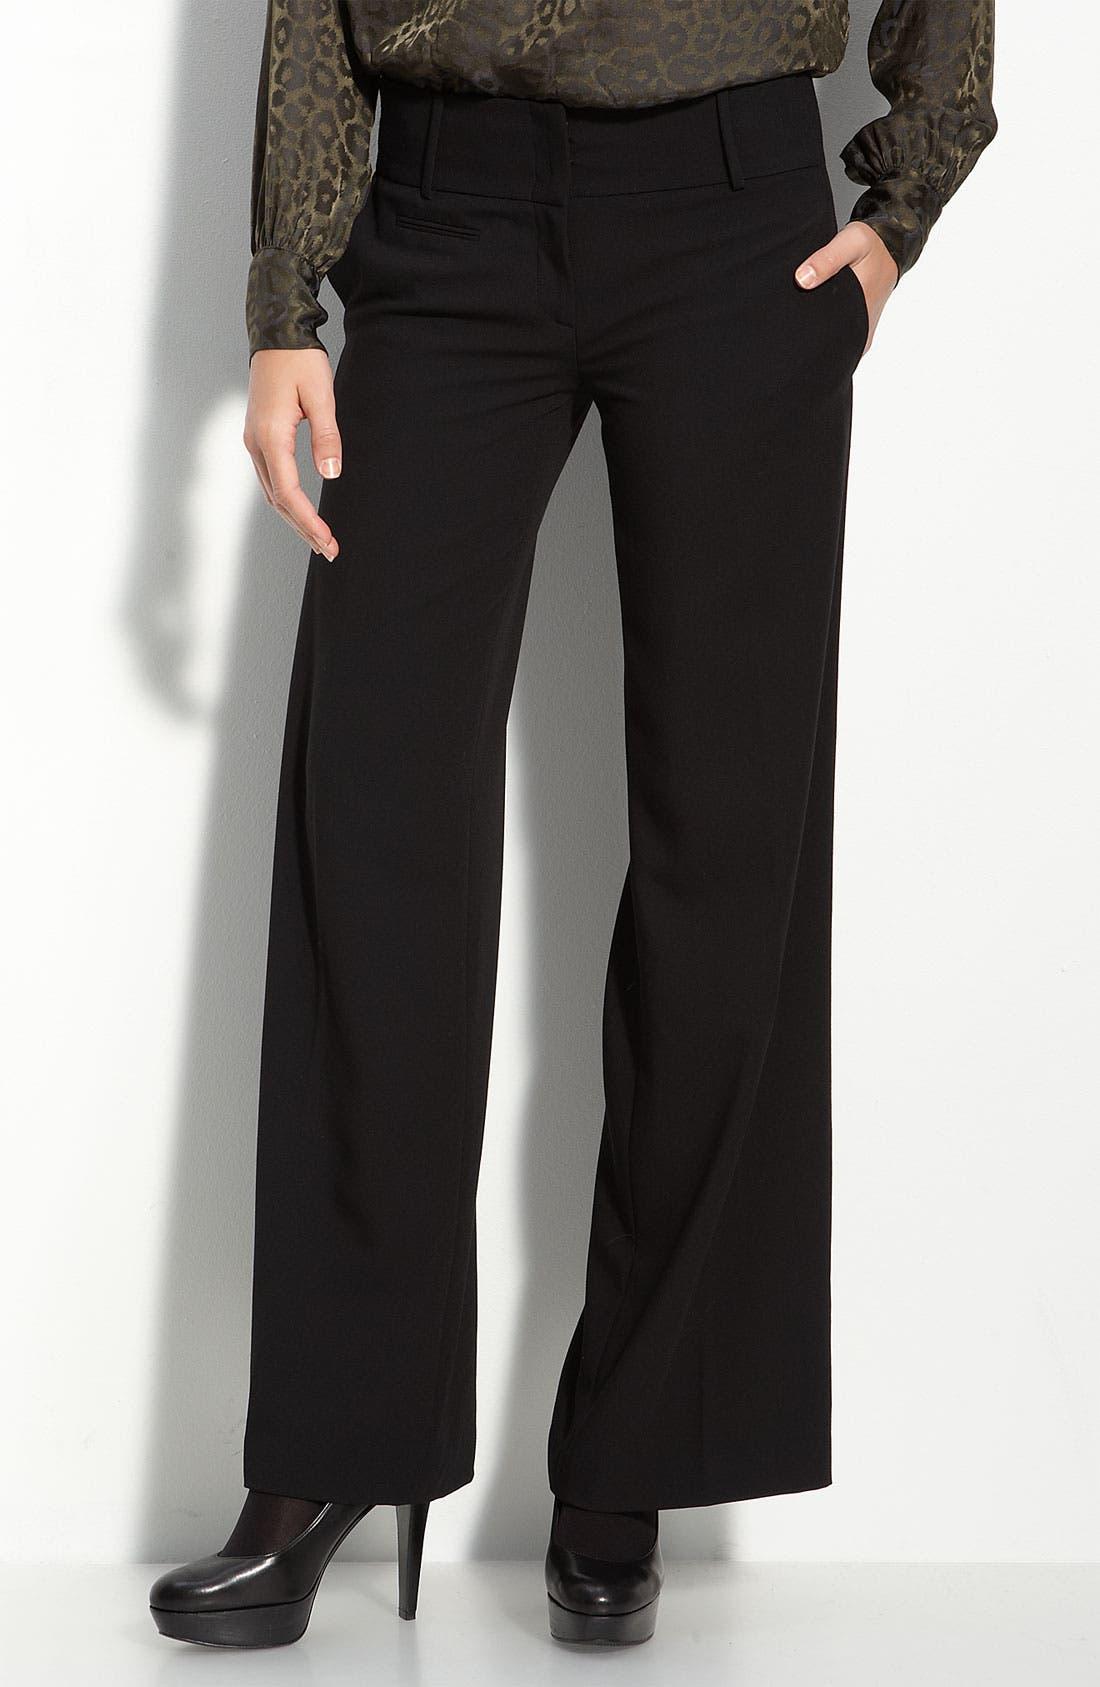 Main Image - BCBGMAXAZRIA Wide Leg Trousers